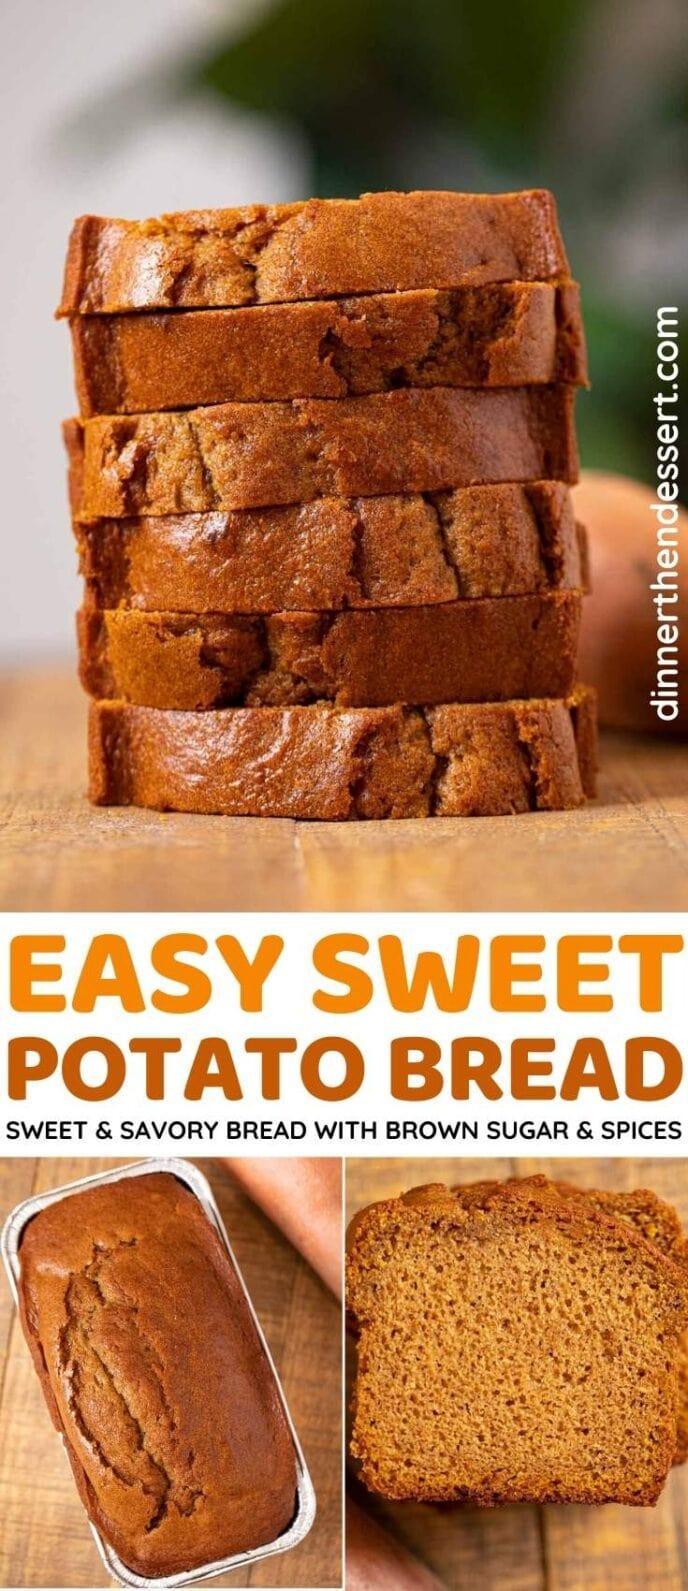 Sweet Potato Bread collage